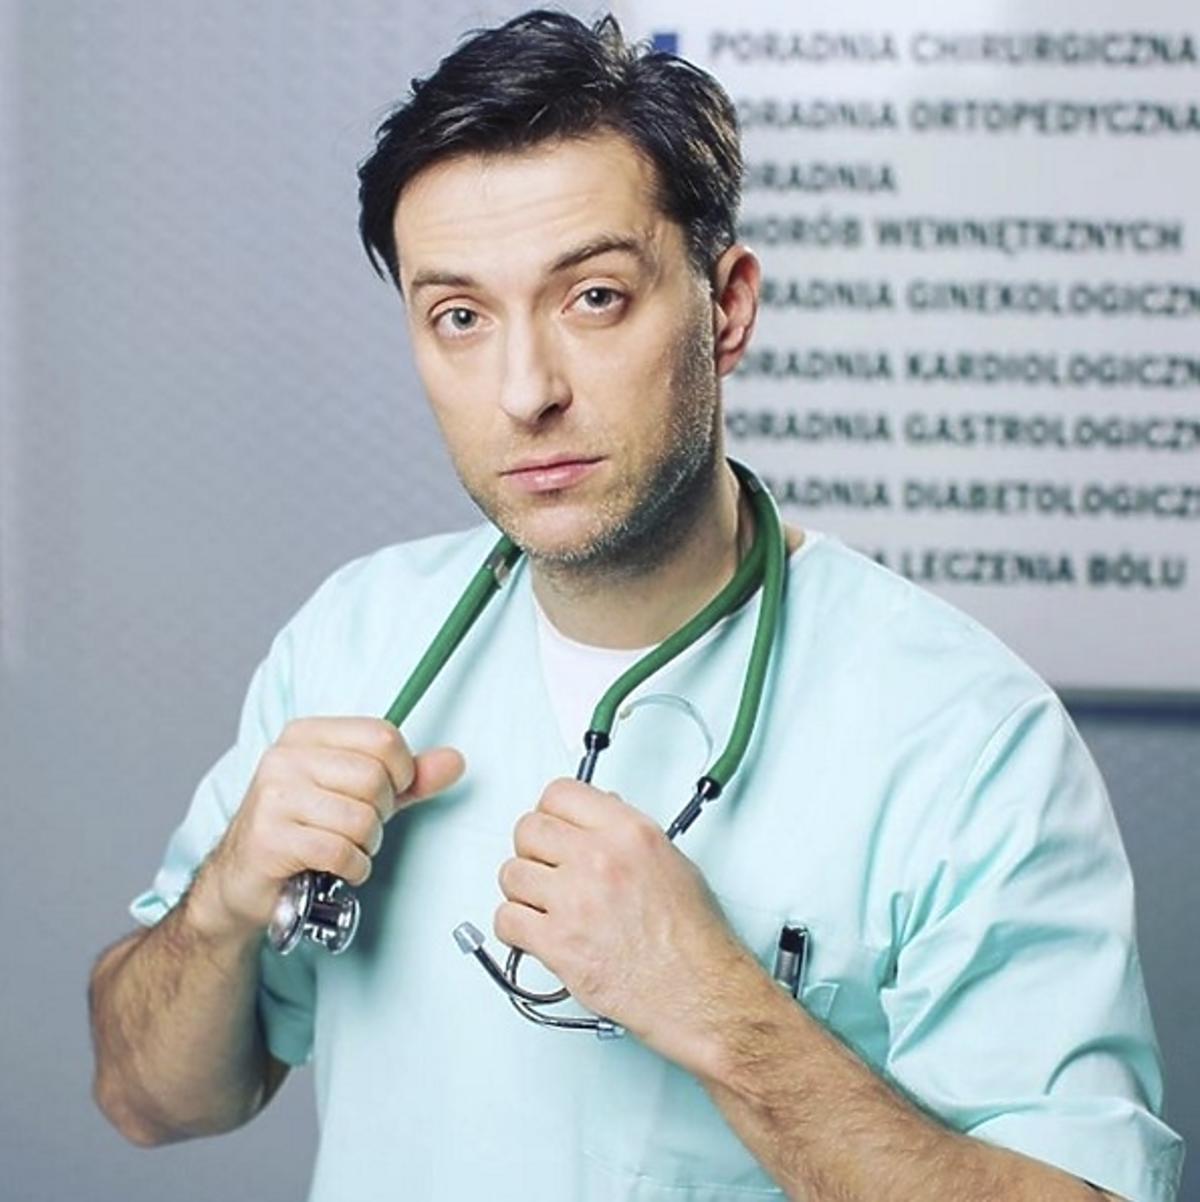 Filip Bobek w